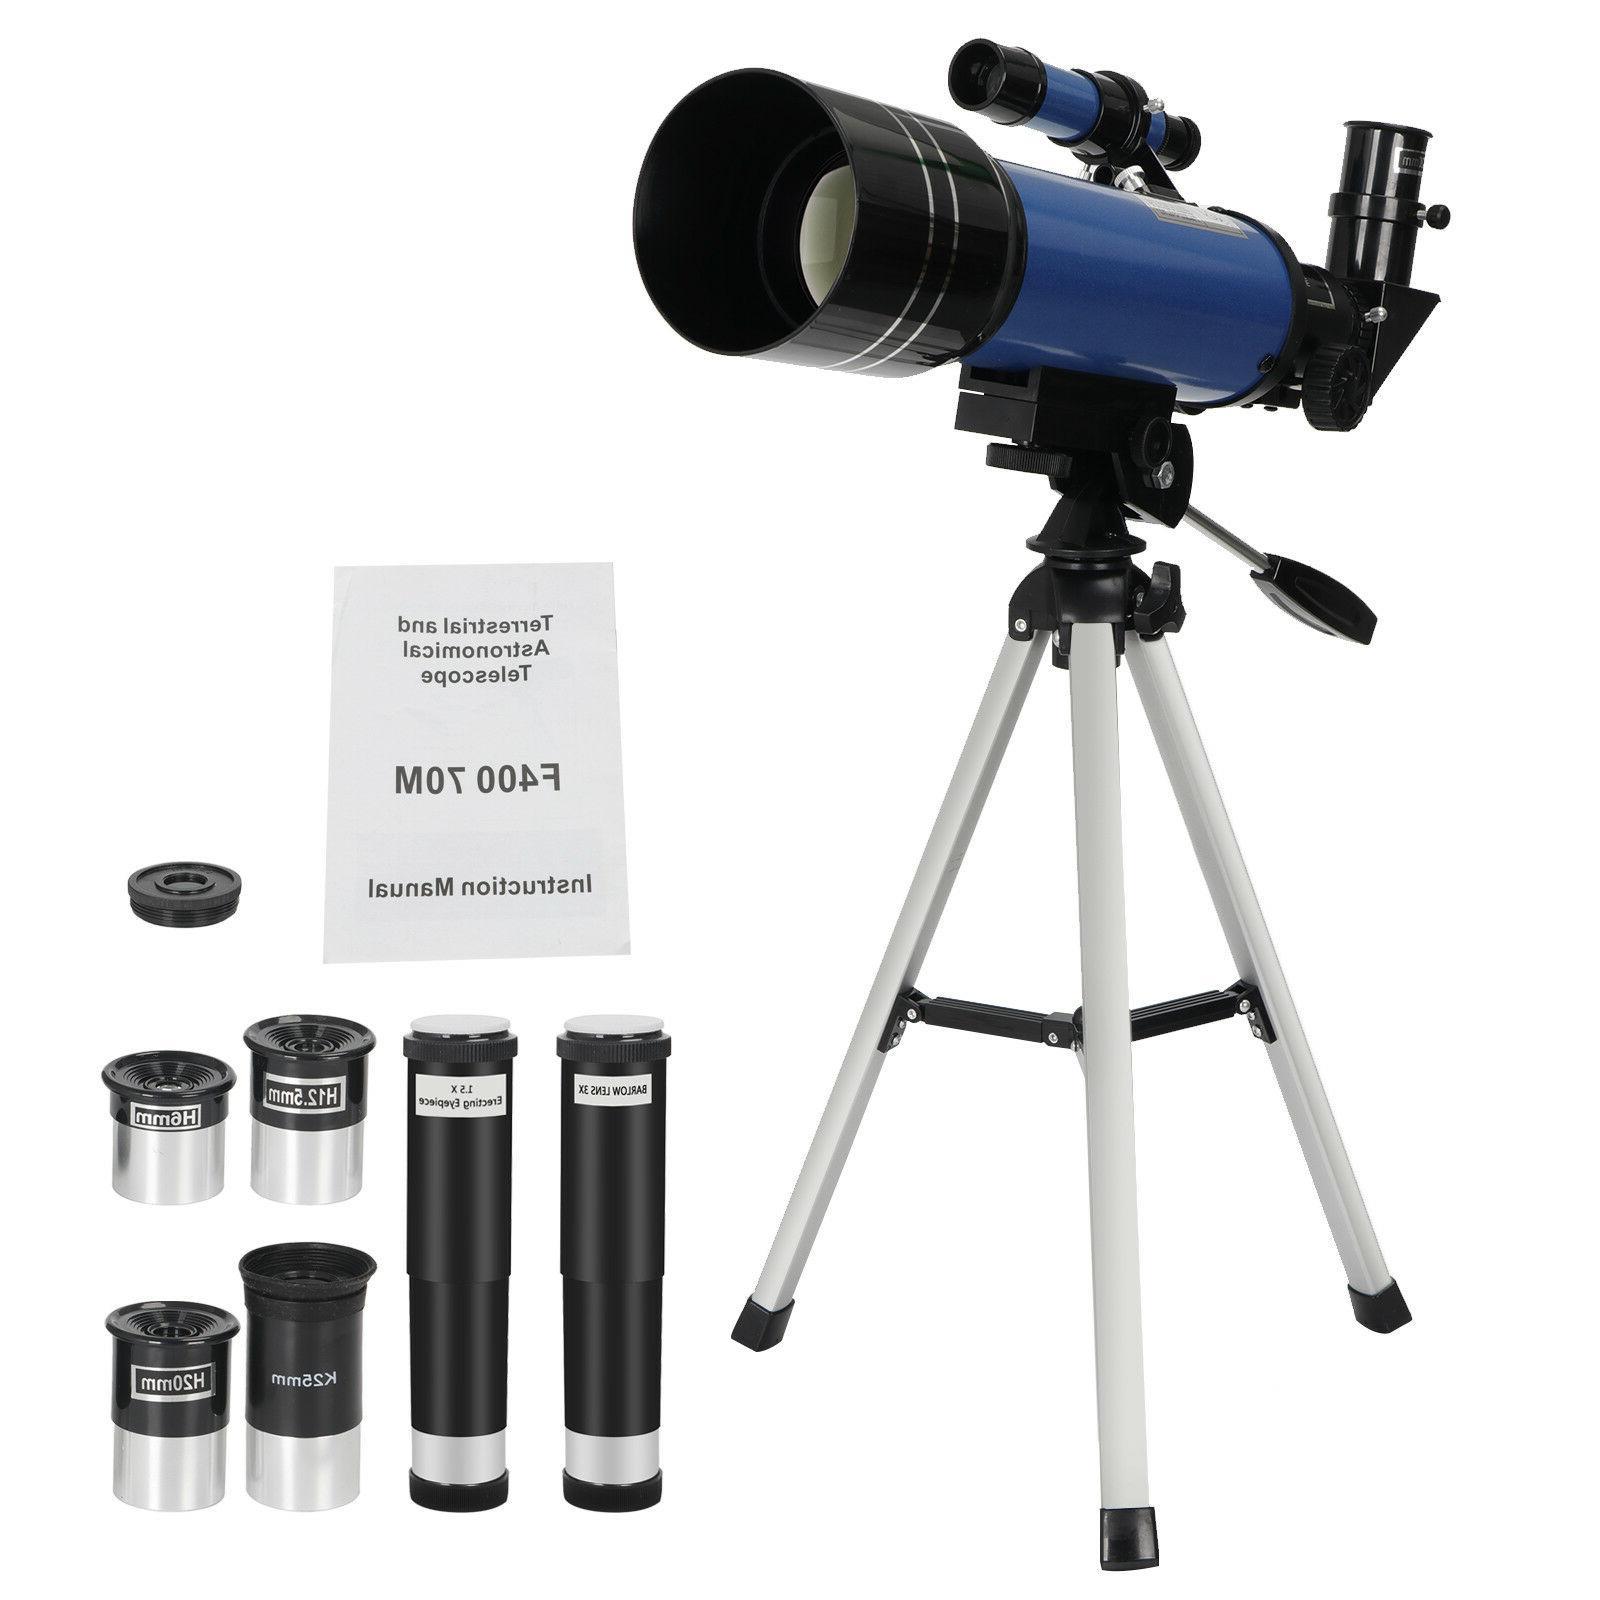 70mm Portable Astronomical Telescope Eyepieces Tripod